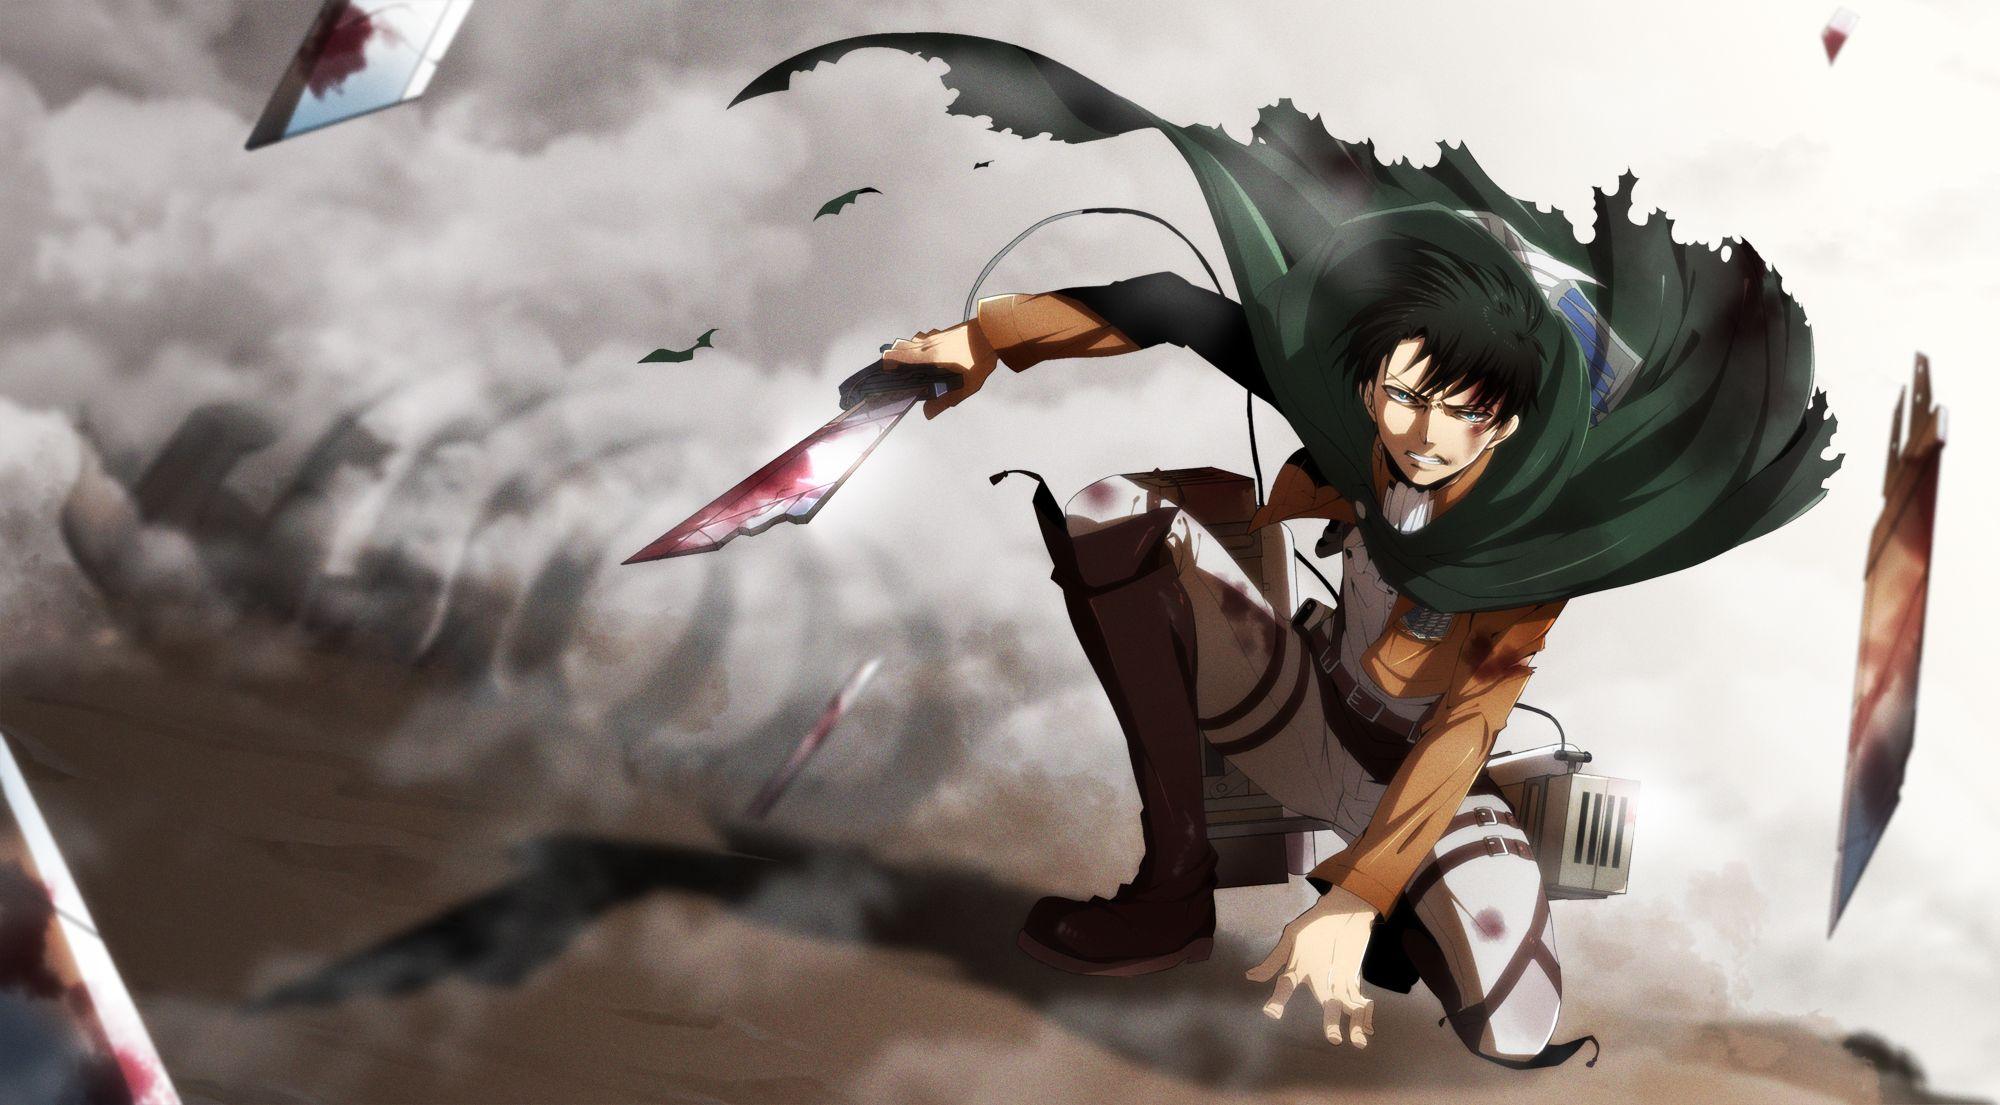 Levi 1578397 Fullsize Image 2000x1105 Zerochan Attack On Titan Levi Attack On Titan Anime Attack On Titan